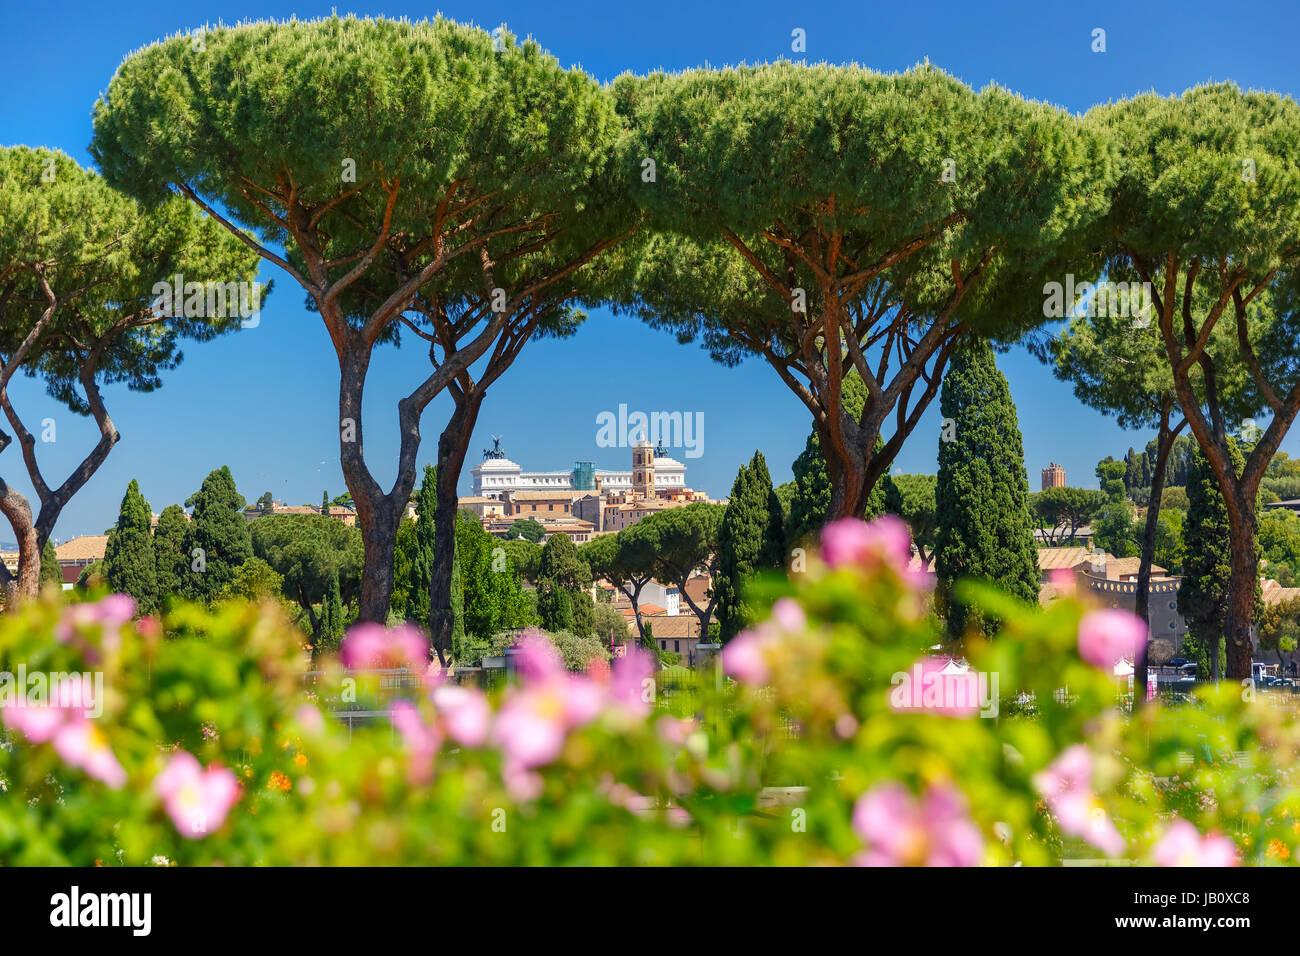 Rome Rose Garden, Italy - Stock Image